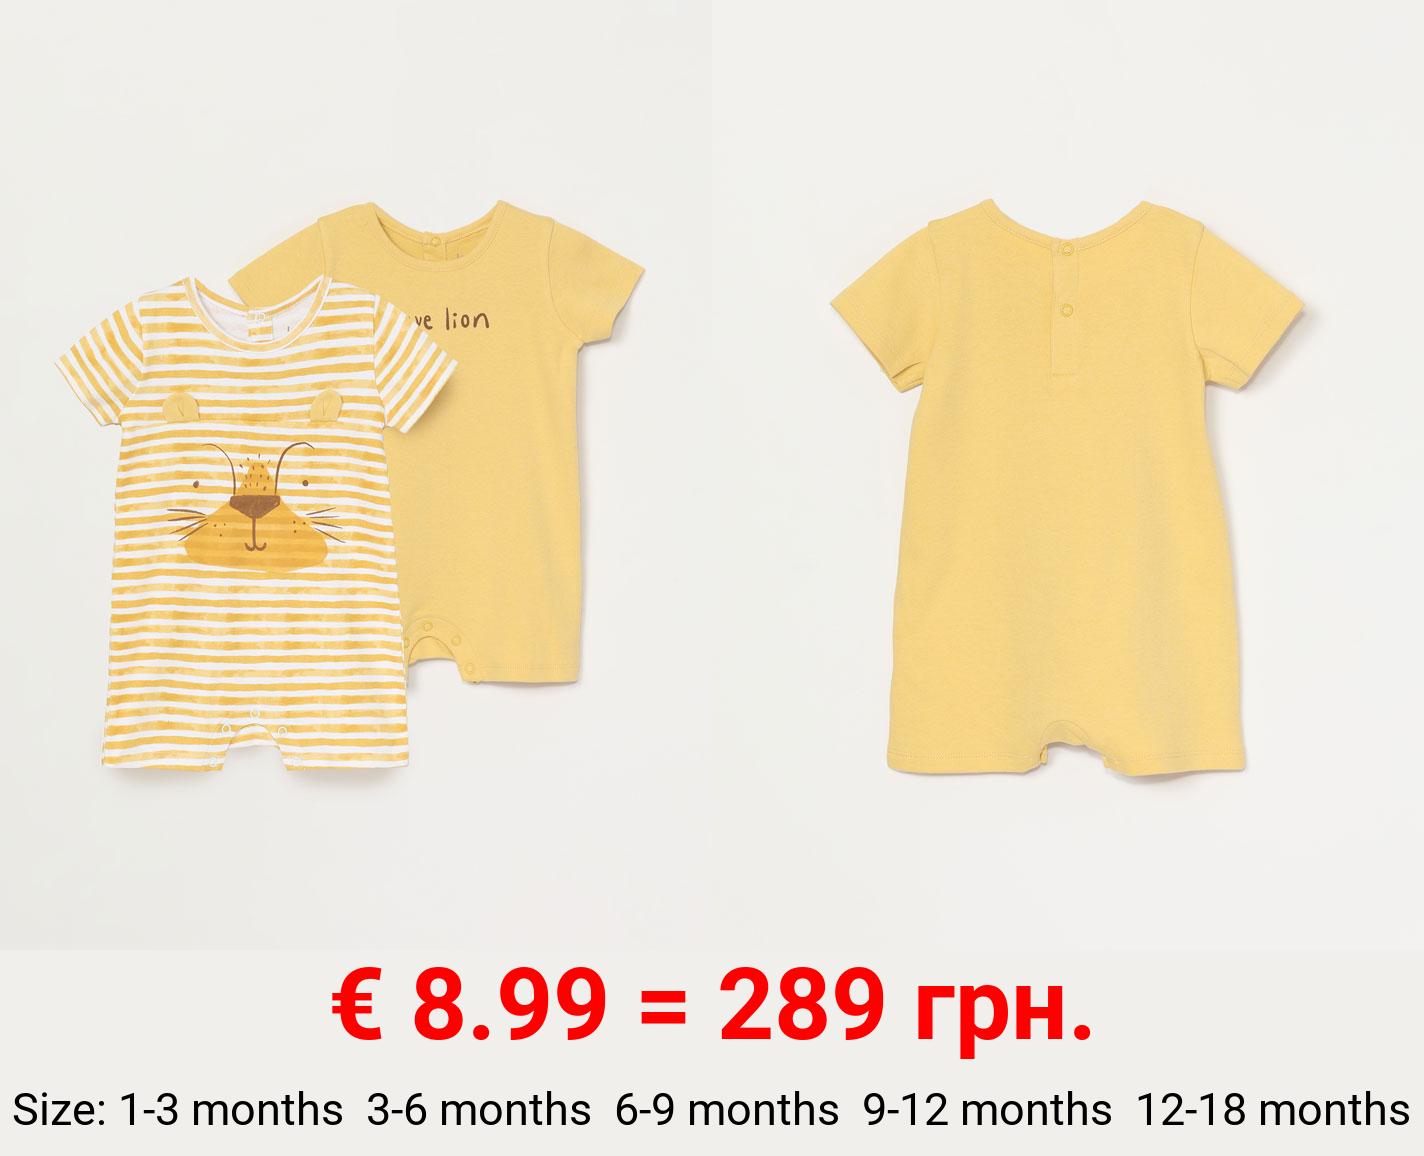 Pack of 2 printed pyjamas